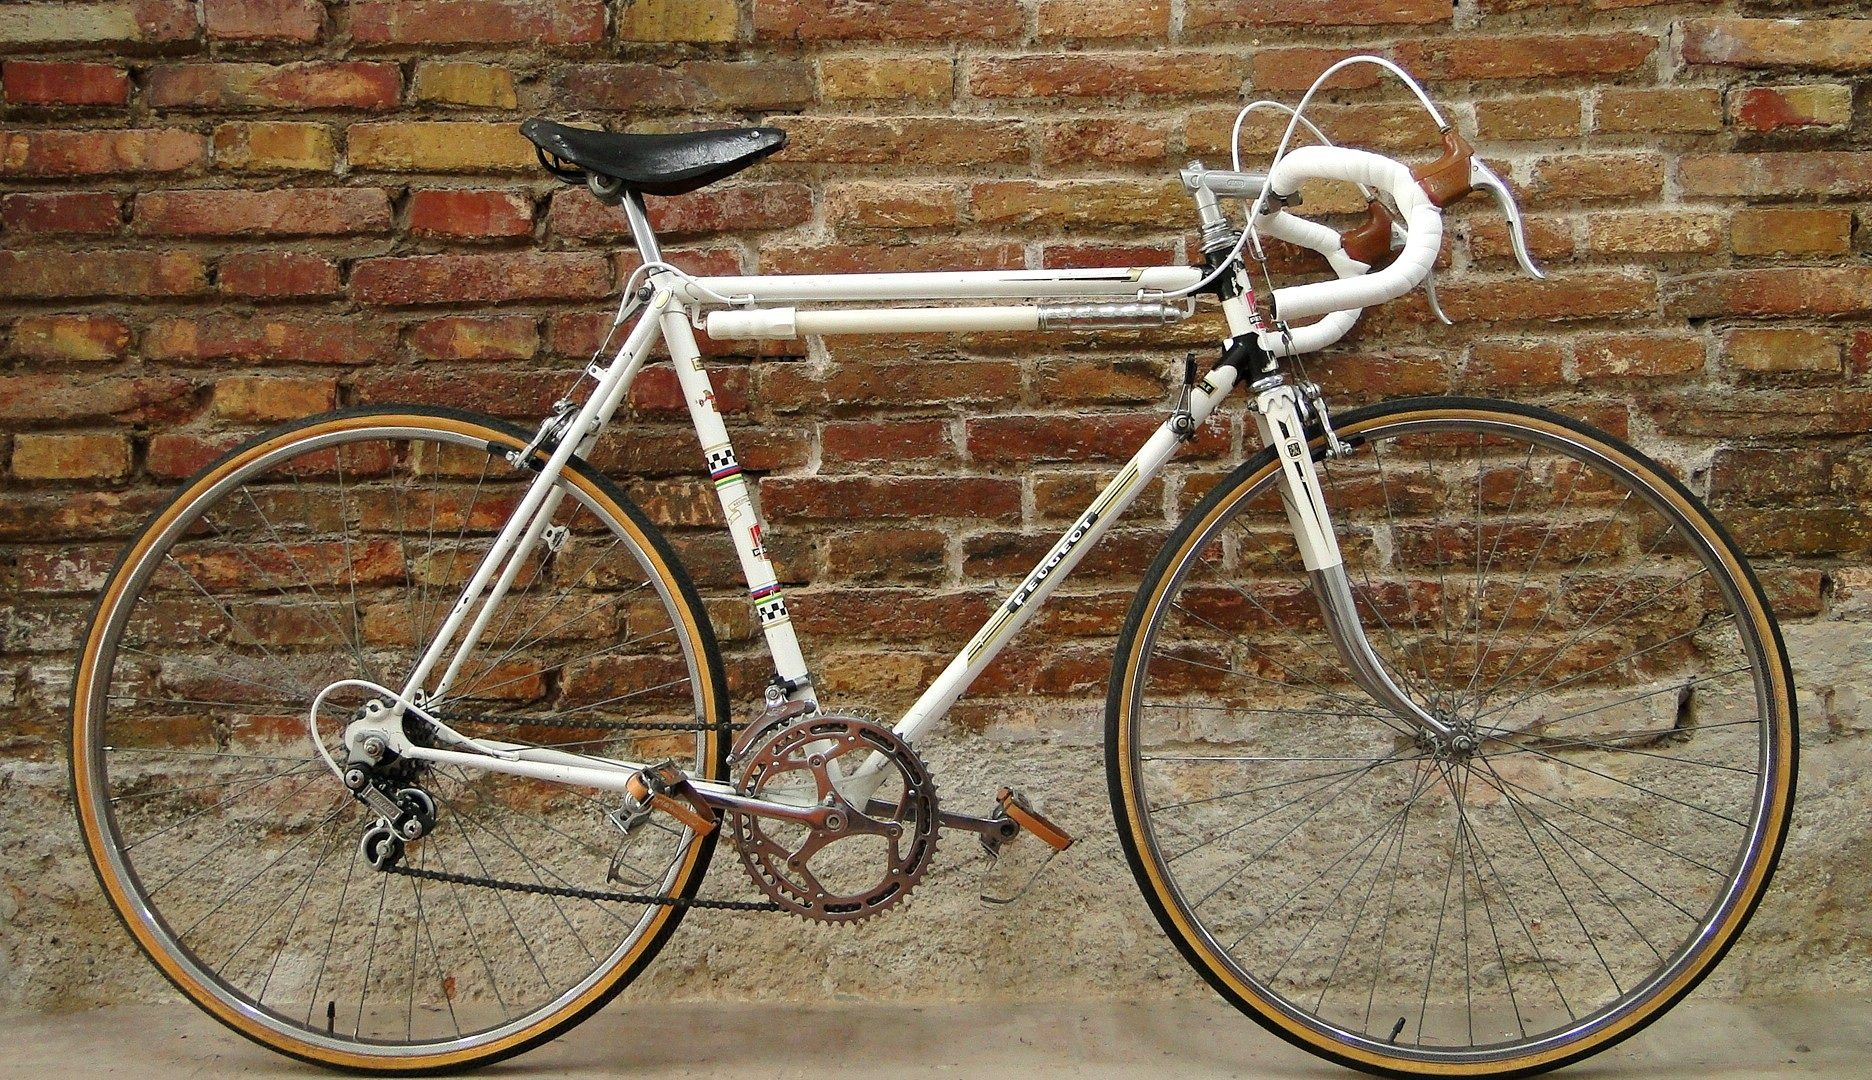 Peugeot Px8 1972 Classic Road Bike Vintage Bicycles Peugeot Bike